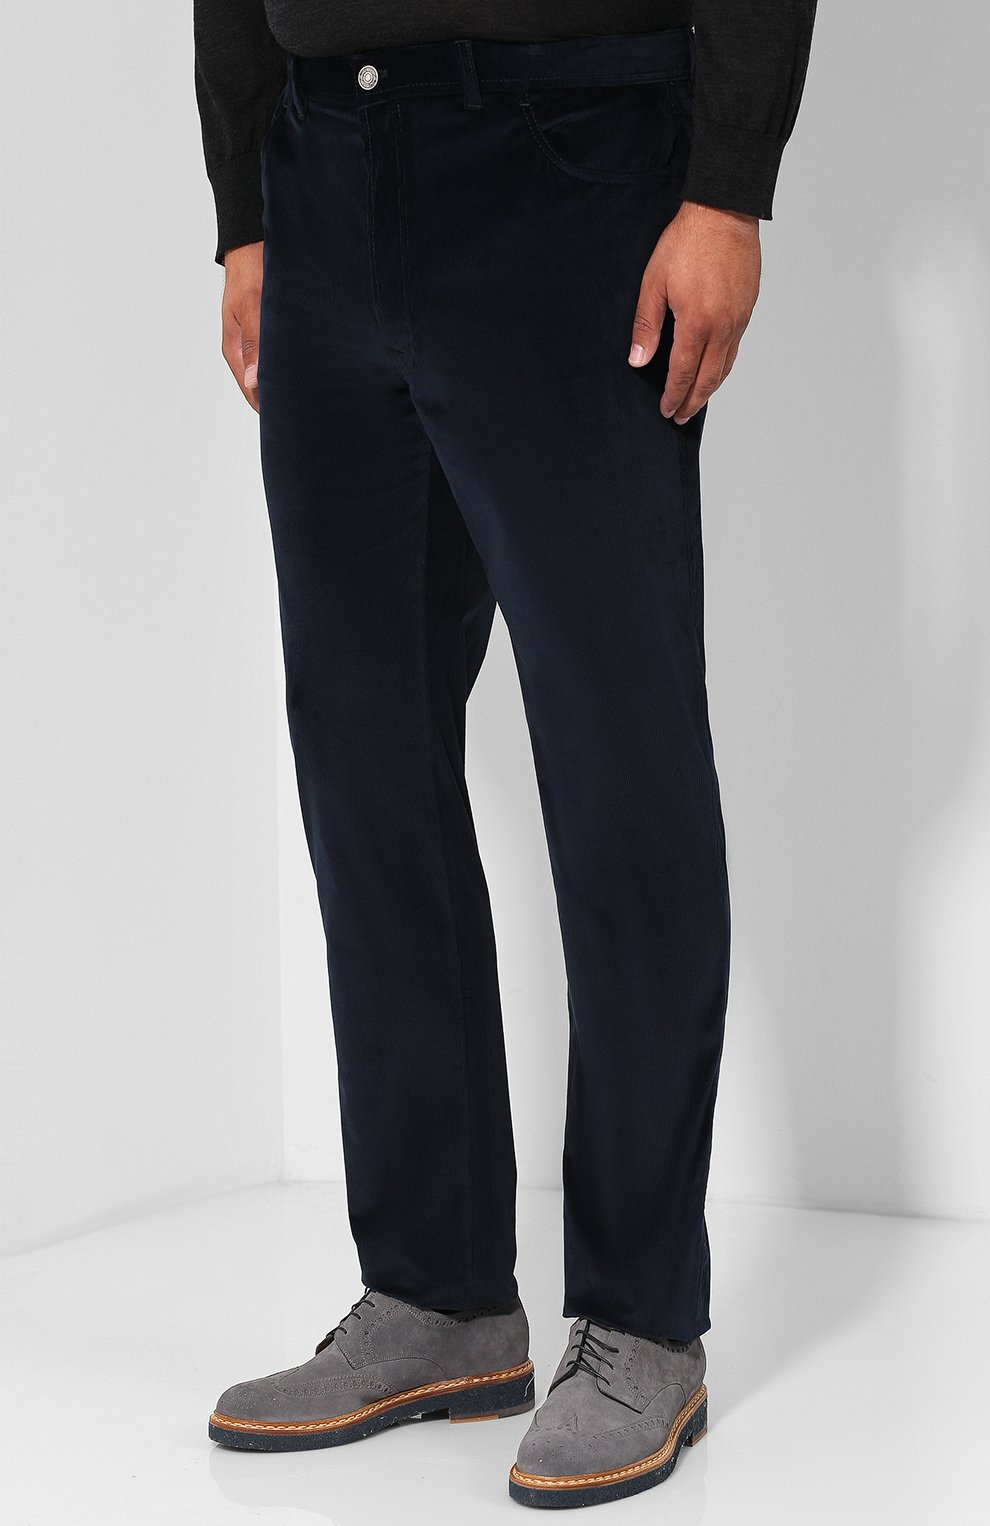 Мужские хлопковые брюки прямого кроя BRIONI темно-синего цвета, арт. SPLE0M/0Z002/CHAM0NIX | Фото 3